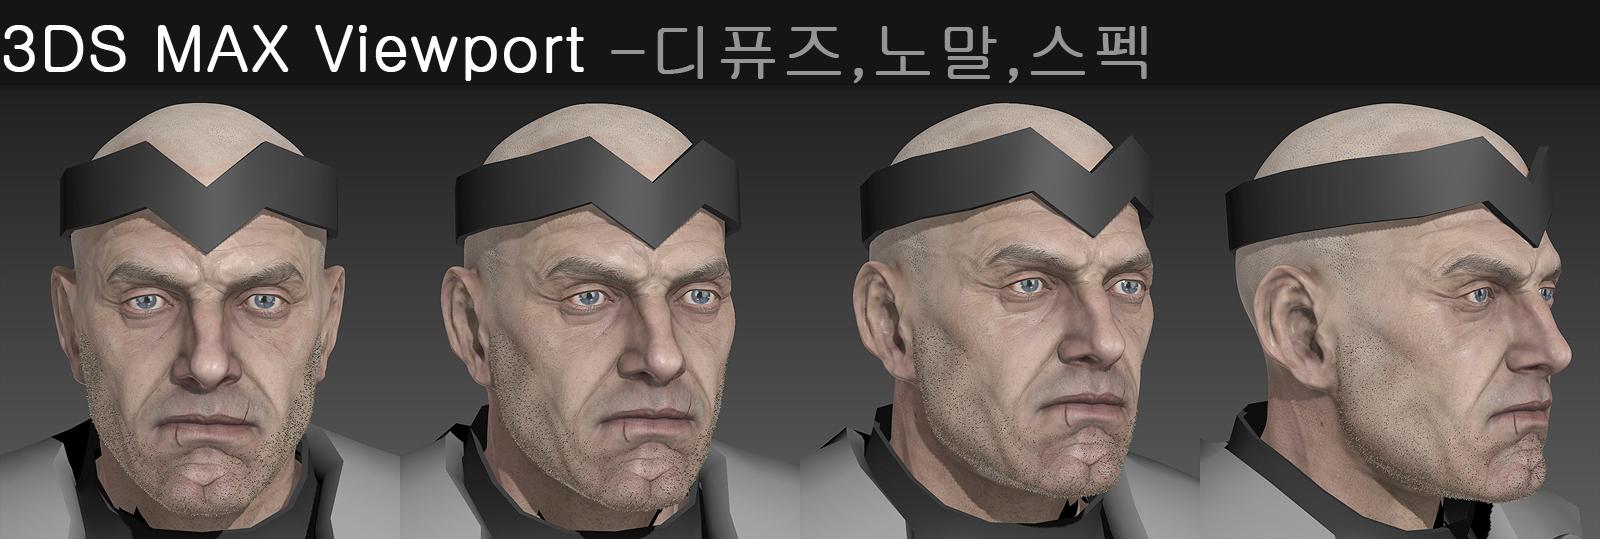 Head Modeling3(클릭 시 큰 그림이 나옵니다.)